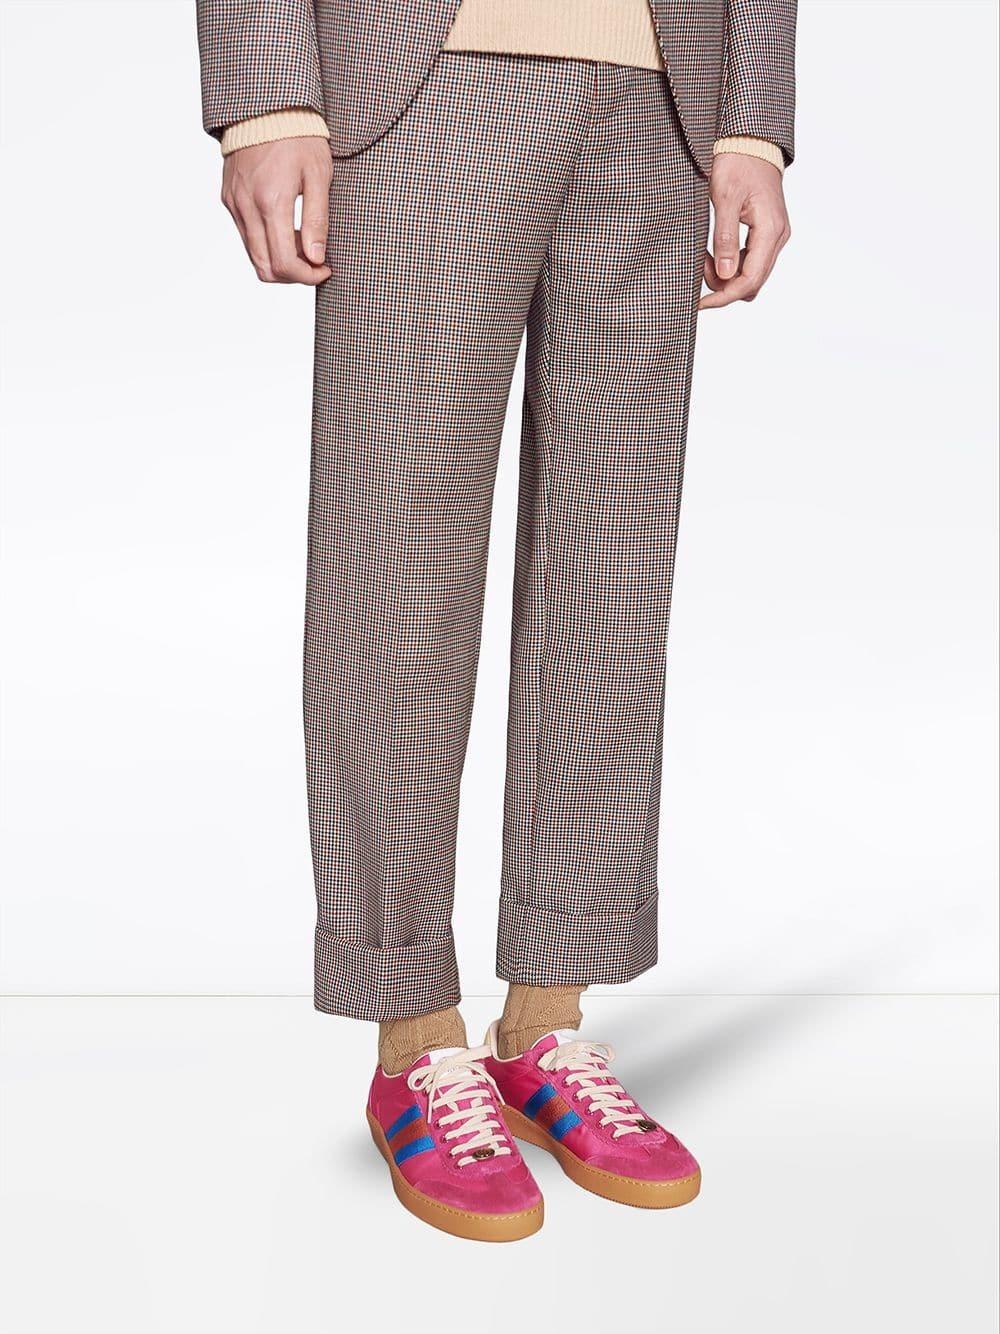 Gucci G74 Nylon Sneaker With Web, $586